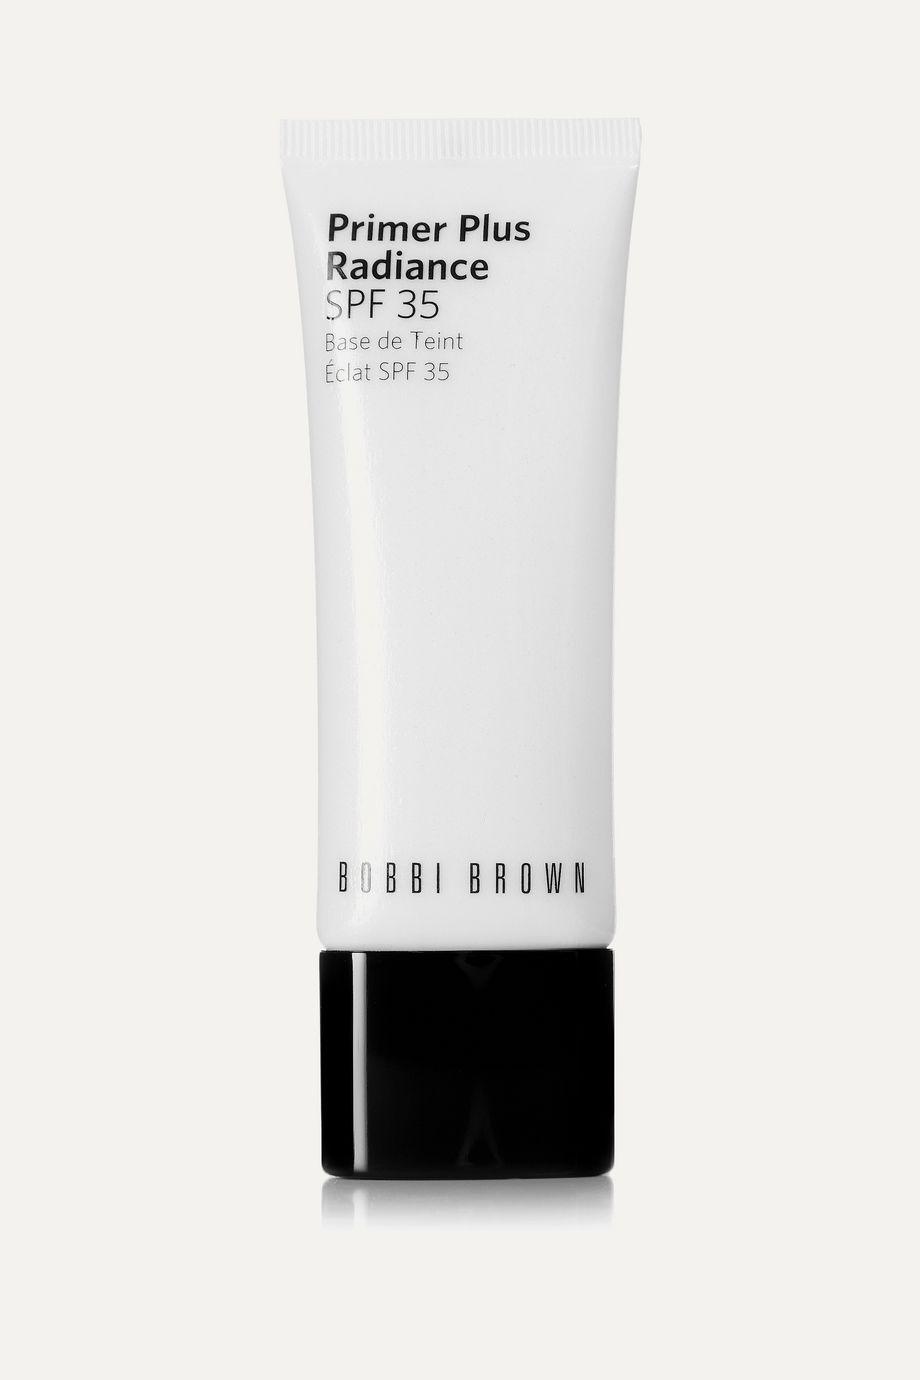 Bobbi Brown Primer Plus Radiance SPF35, 40ml